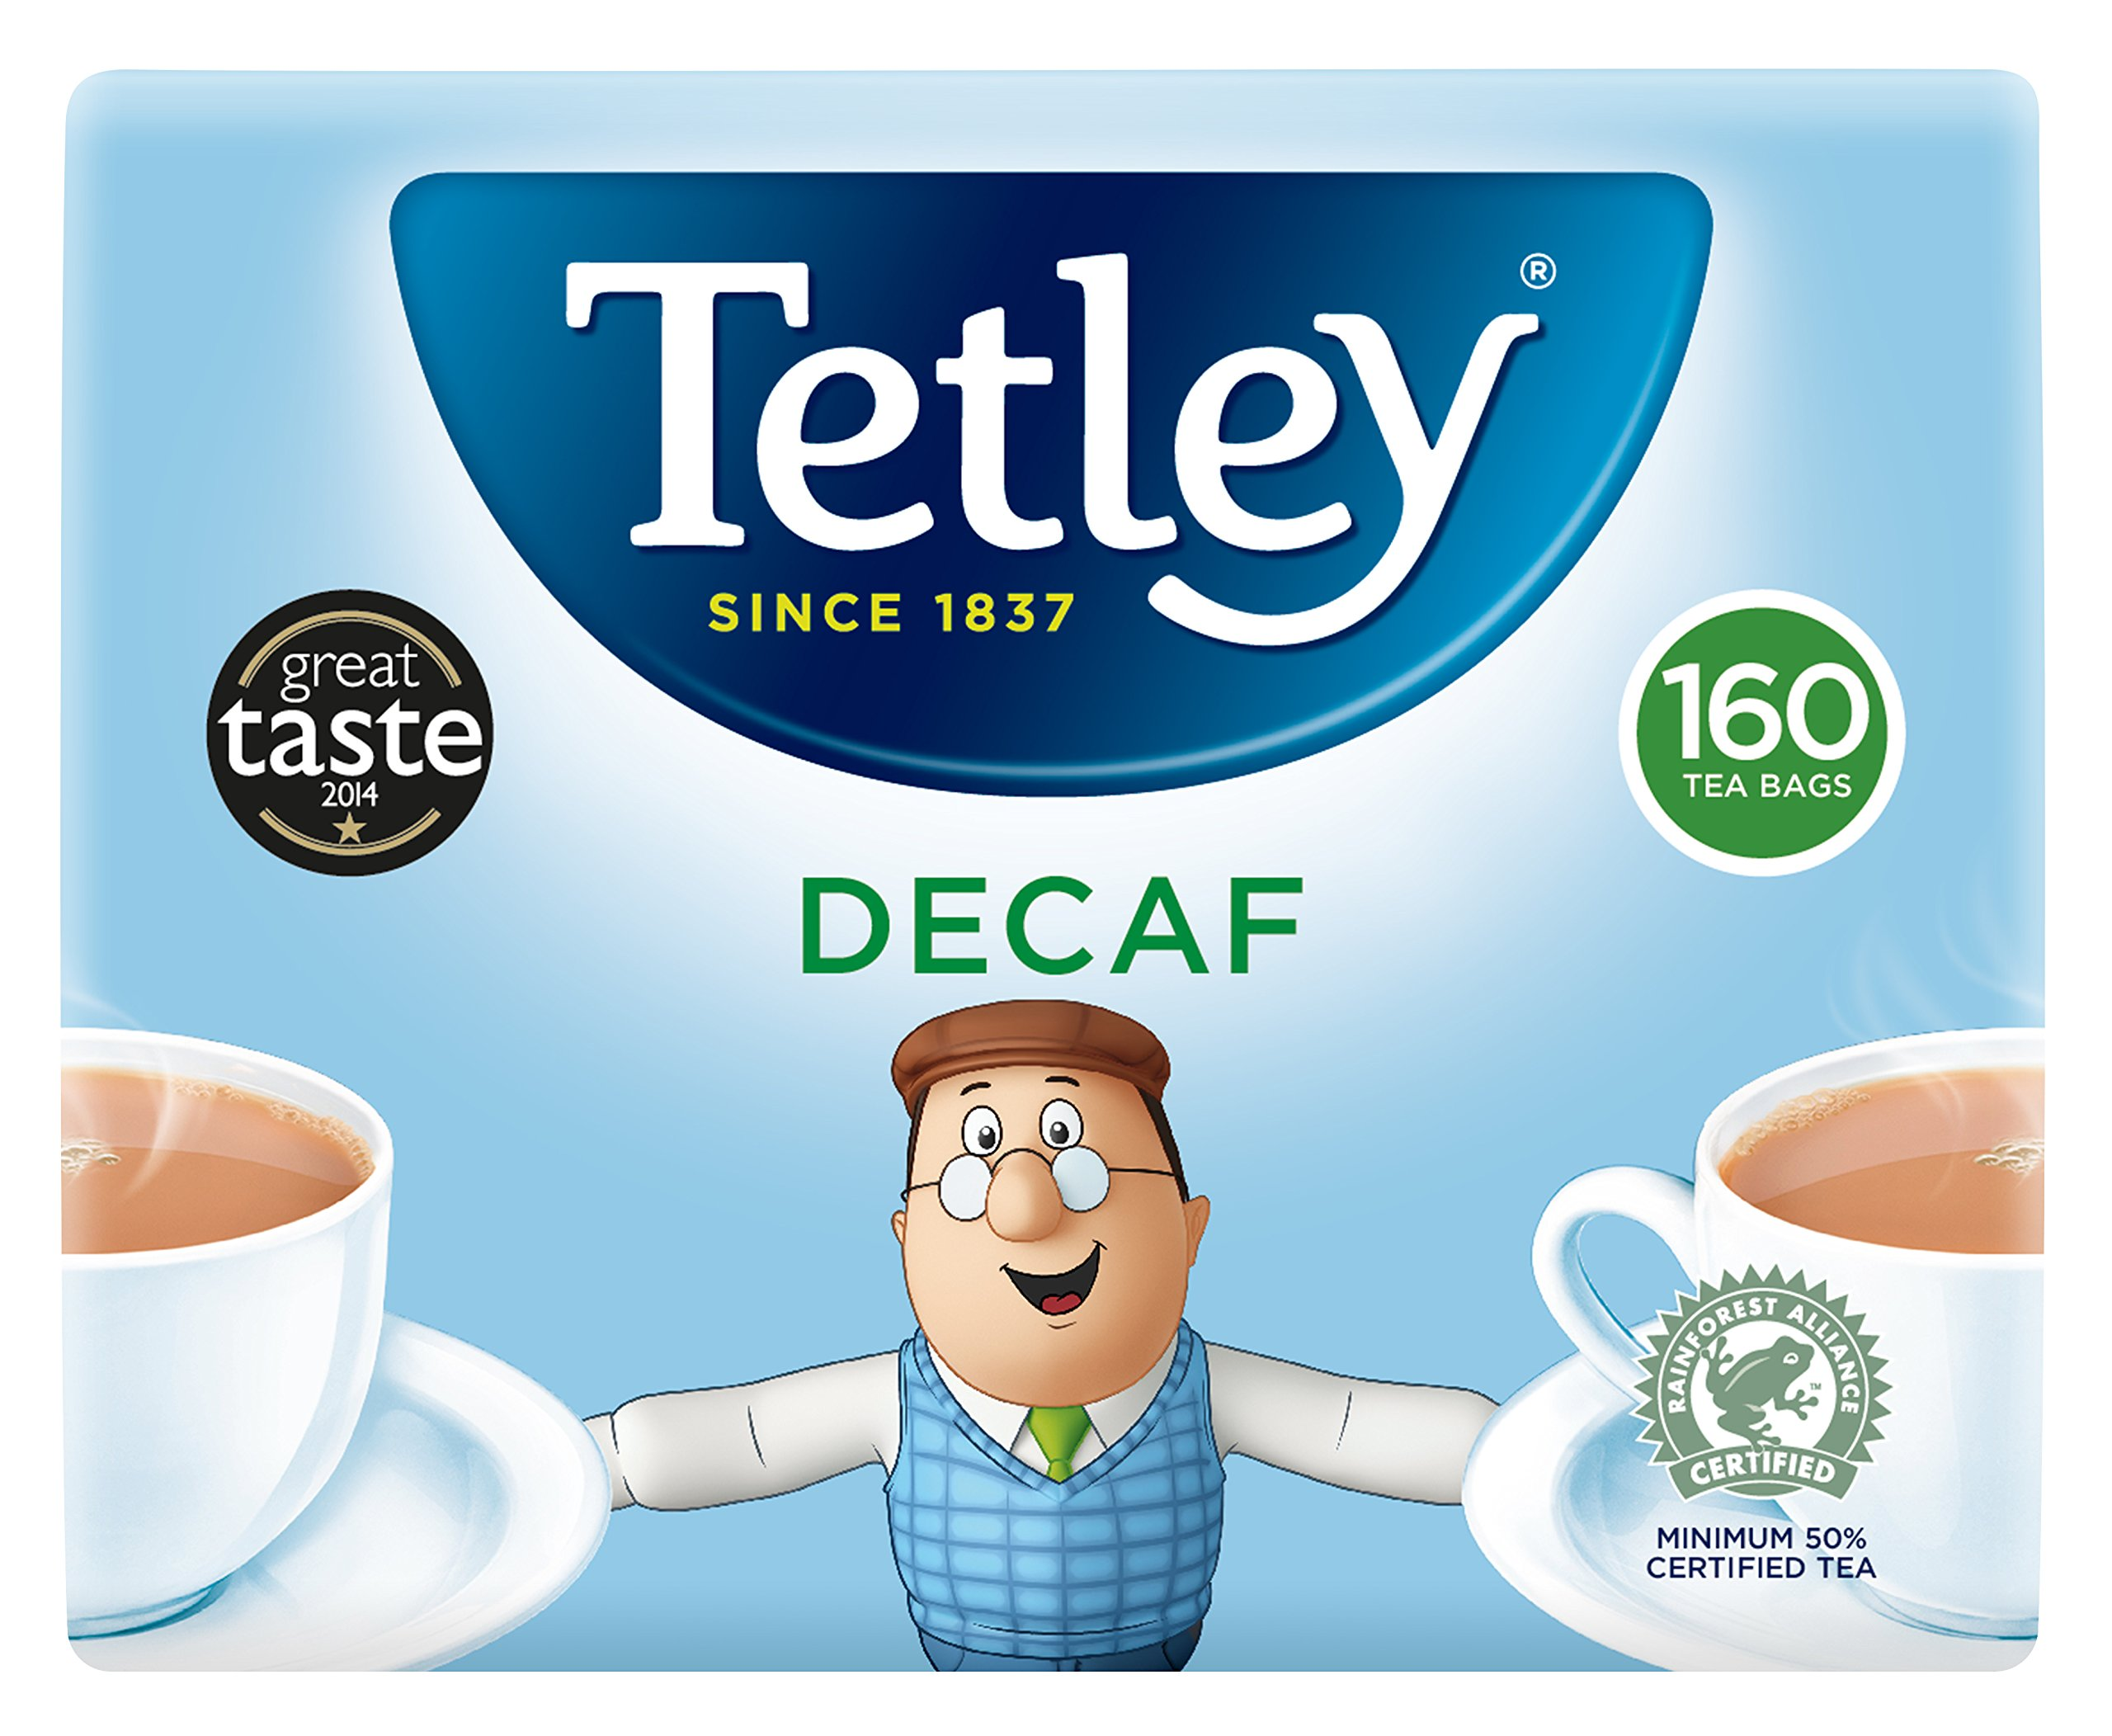 Tetley-A06070-One-Cup-Decaf-Teabags-A06070-PK-160